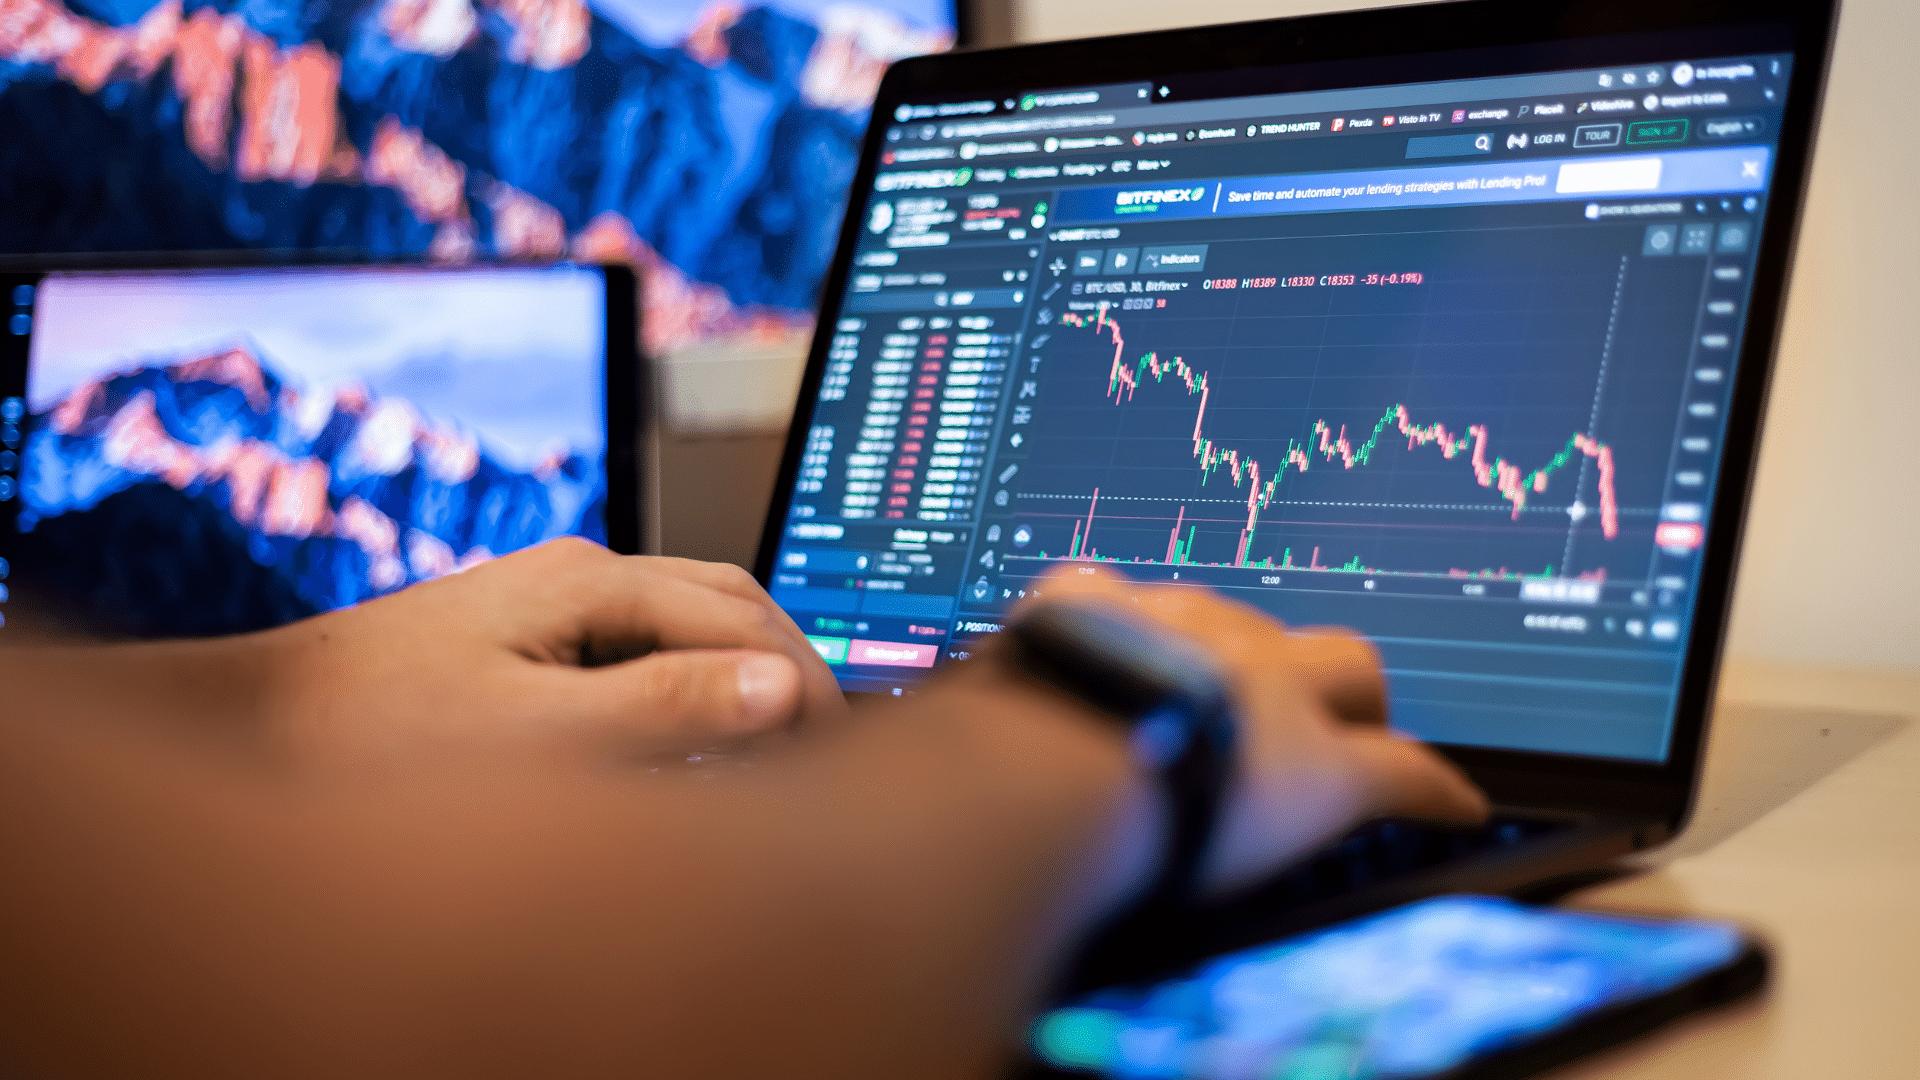 Is Forex Trading Legit?